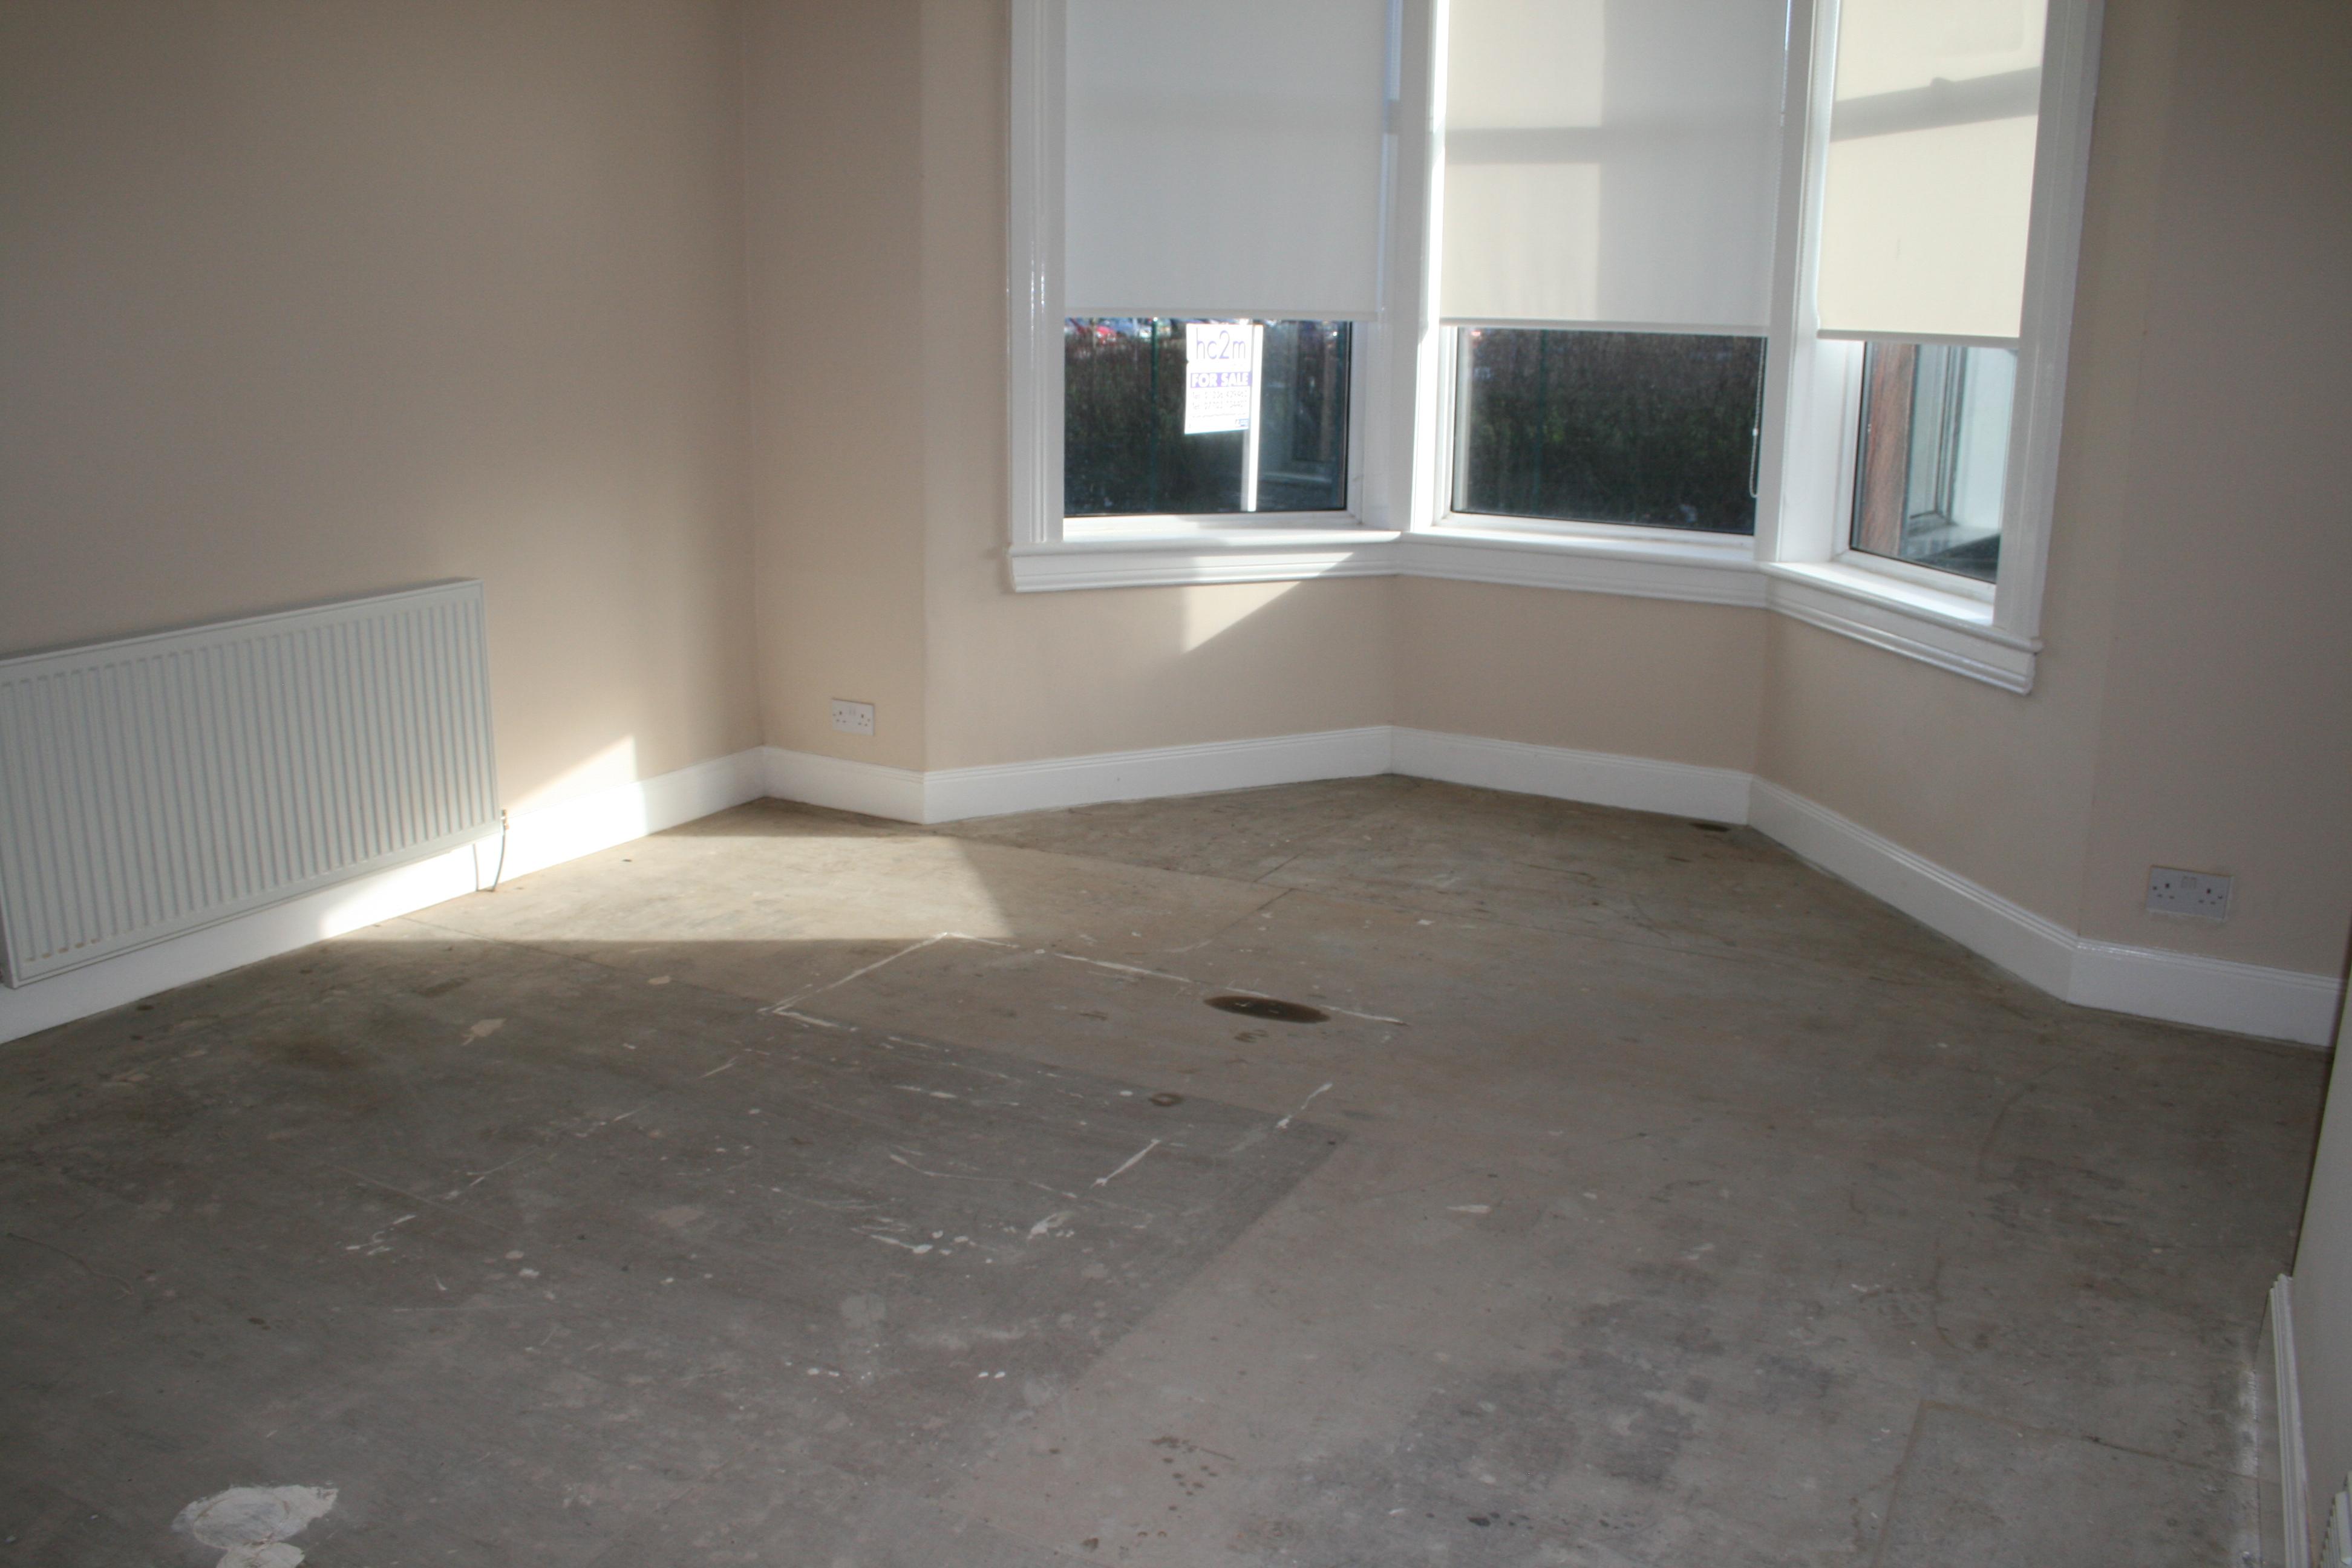 Properties For Sale Bungalow Coatbridge